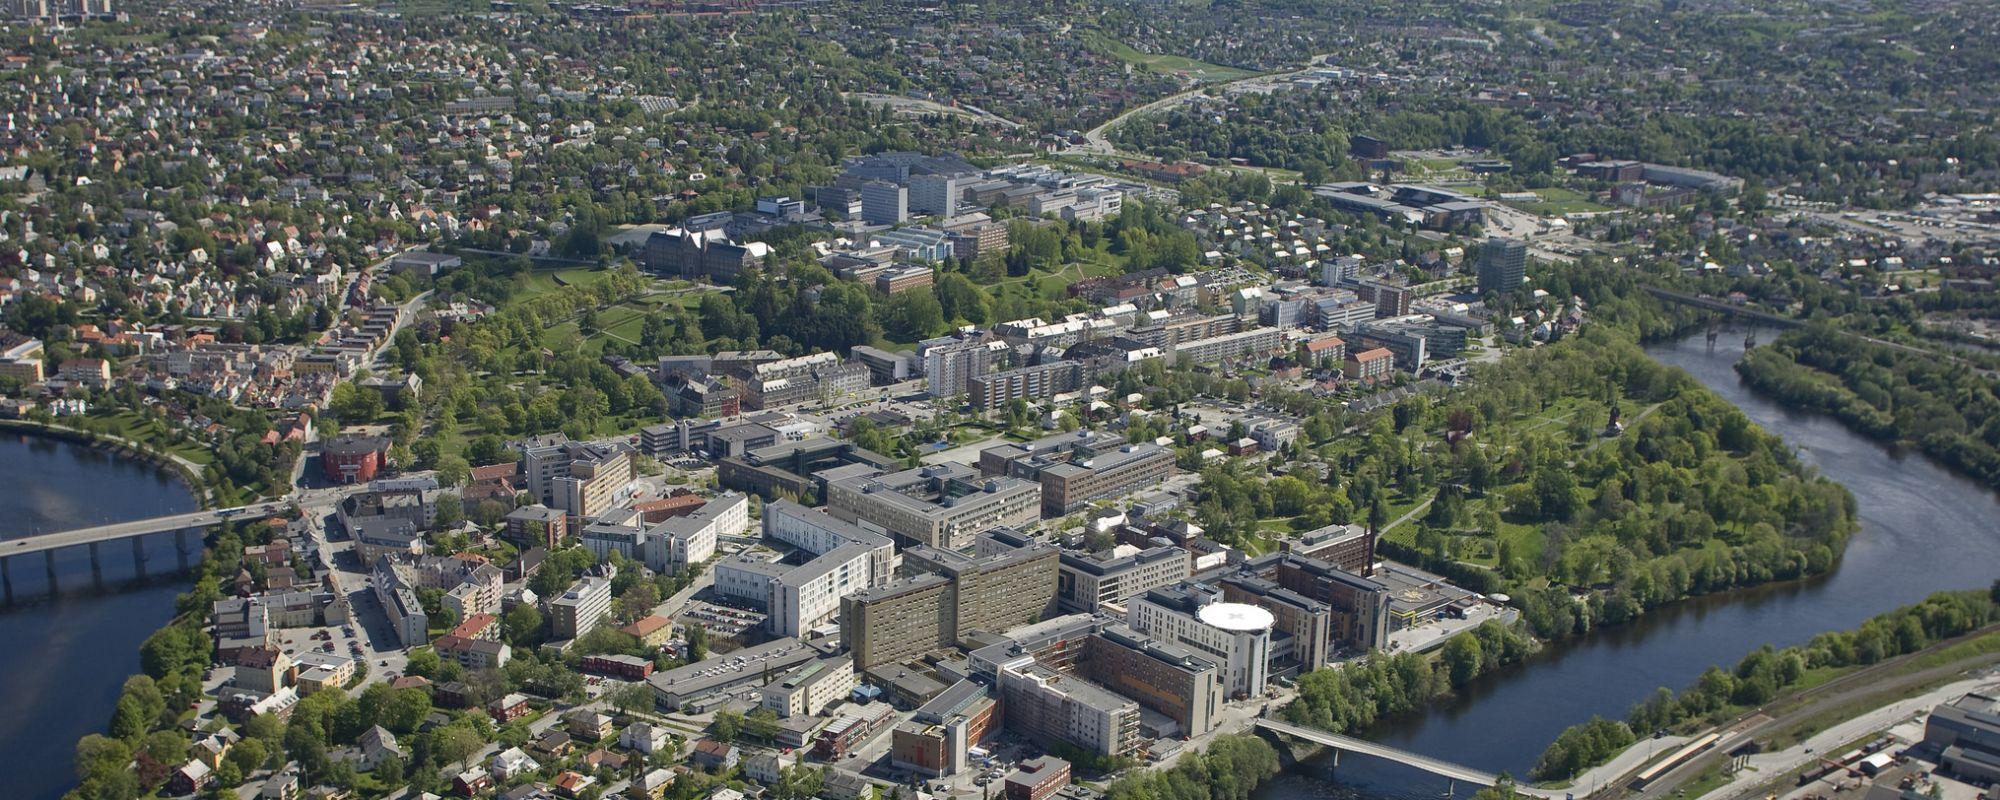 Trondheim, aerial view. Photo.